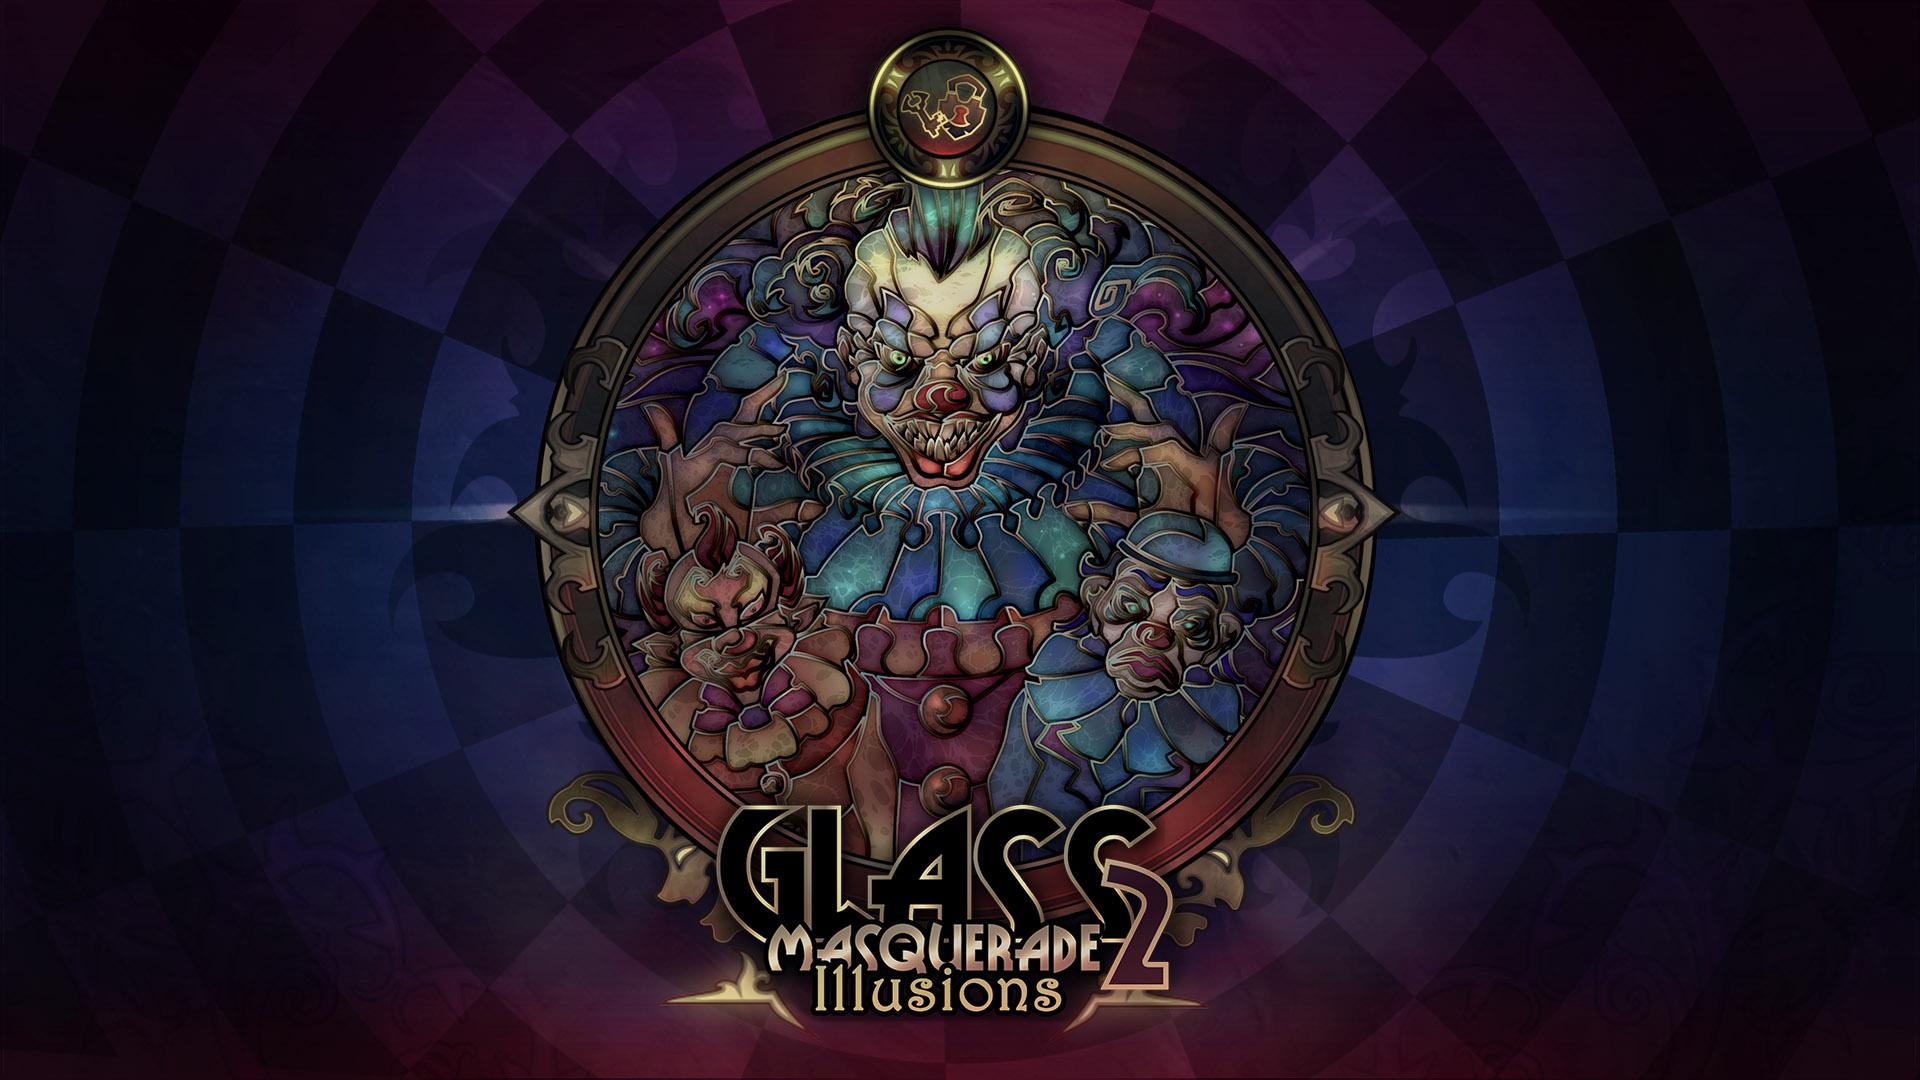 69f2eedee Steam Card Exchange    Showcase    Glass Masquerade 2  Illusions